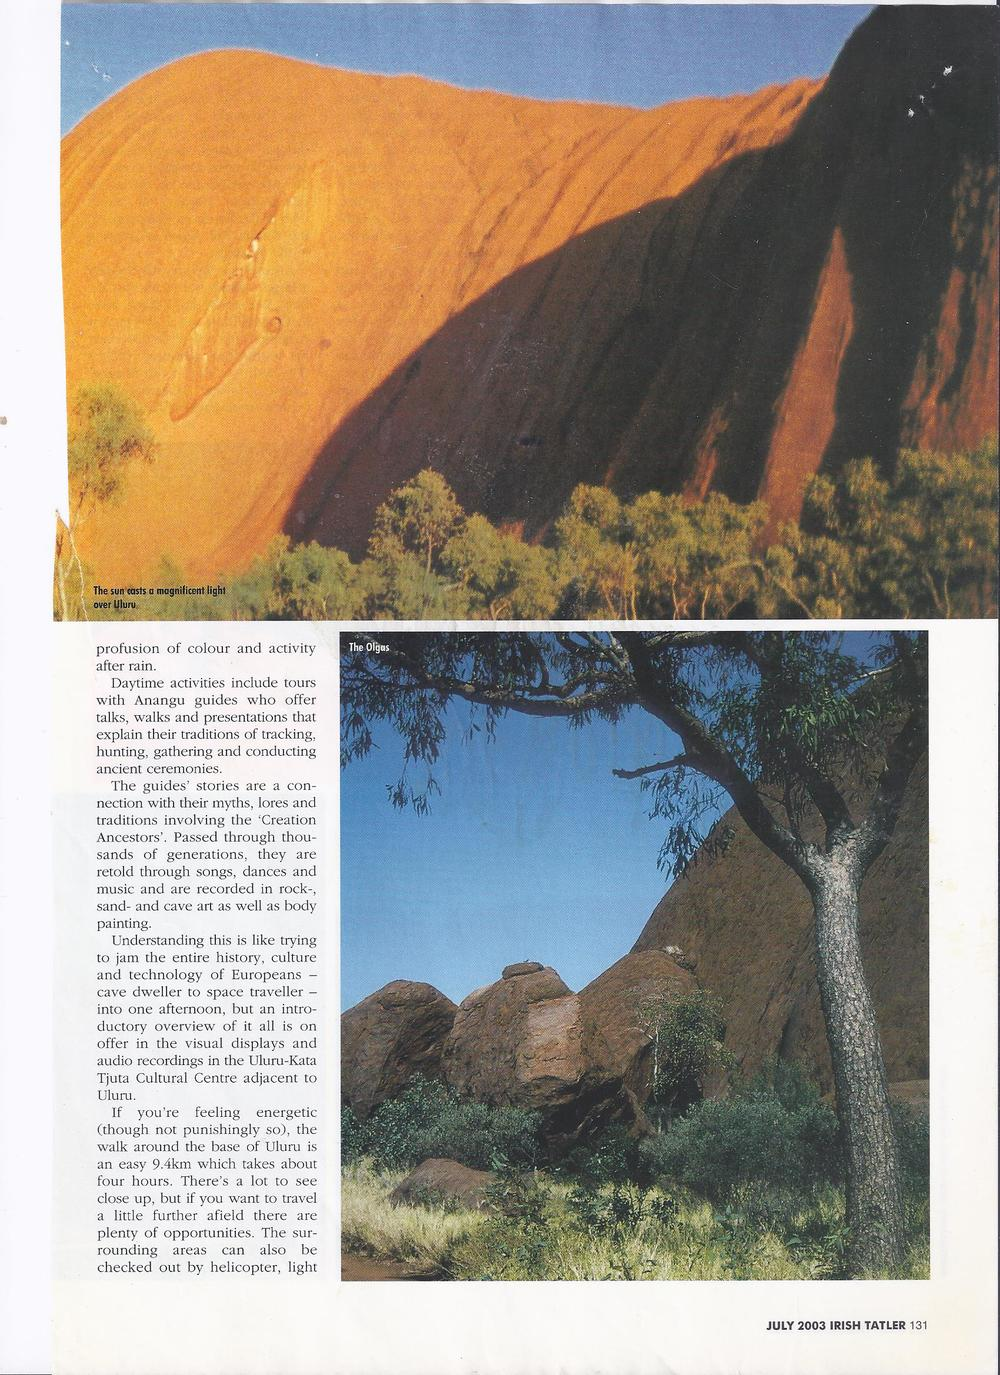 Desert Date Uluru and Kata Tjuta0002.jpg